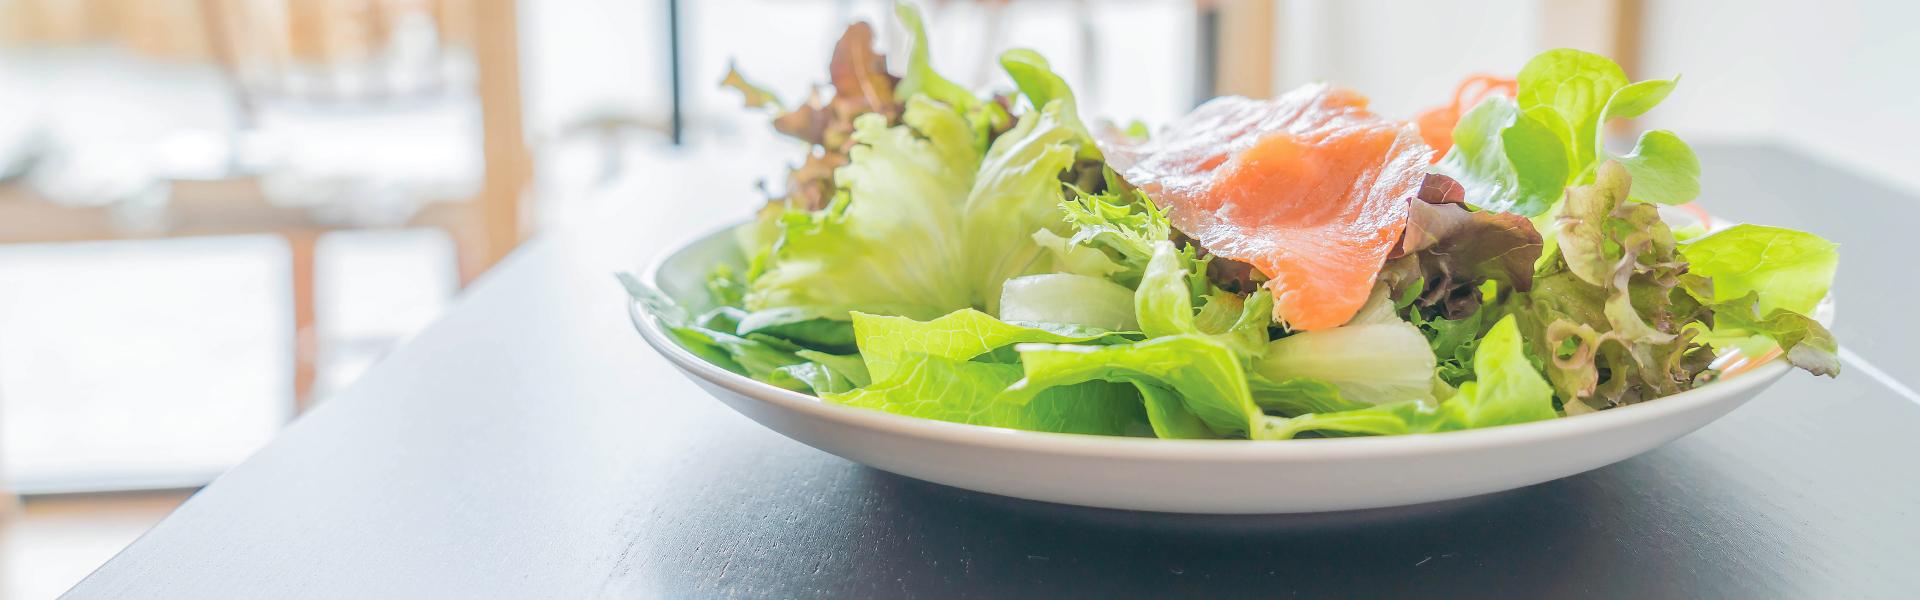 salade-slide-bg